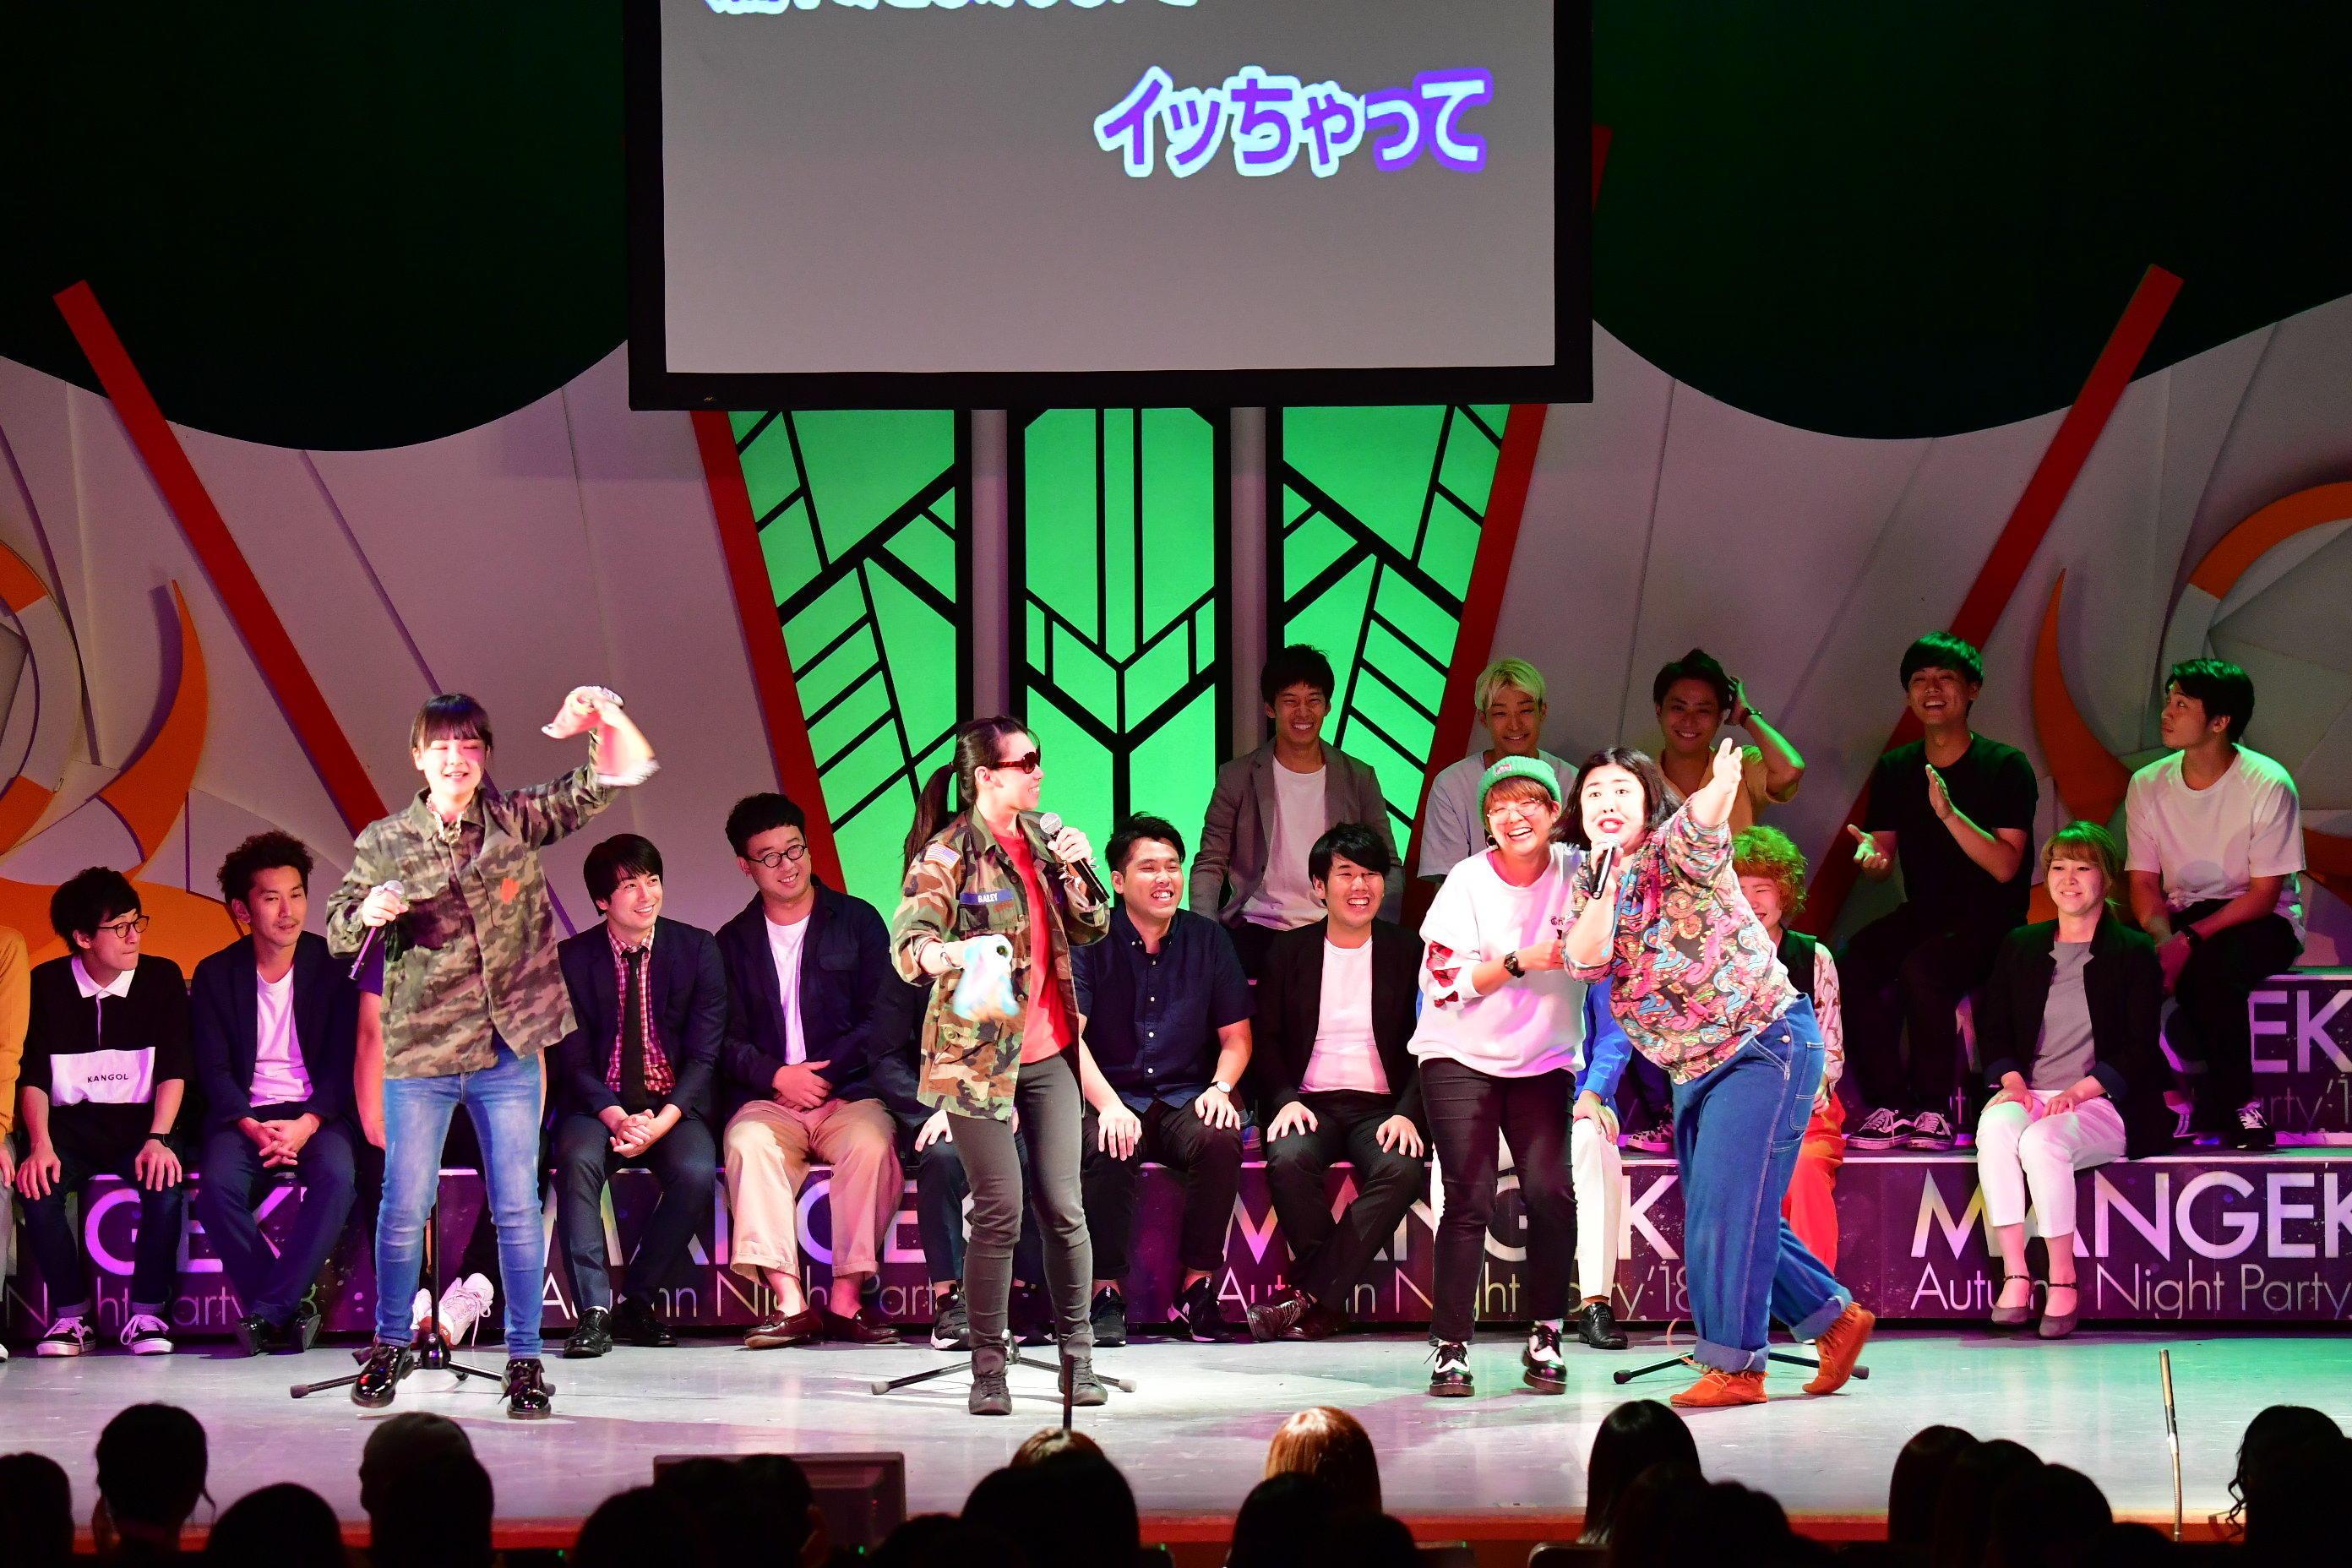 http://news.yoshimoto.co.jp/20180925143407-bde0aa06b1e0b23eadd56b22b61b9e8a7eb4304a.jpg